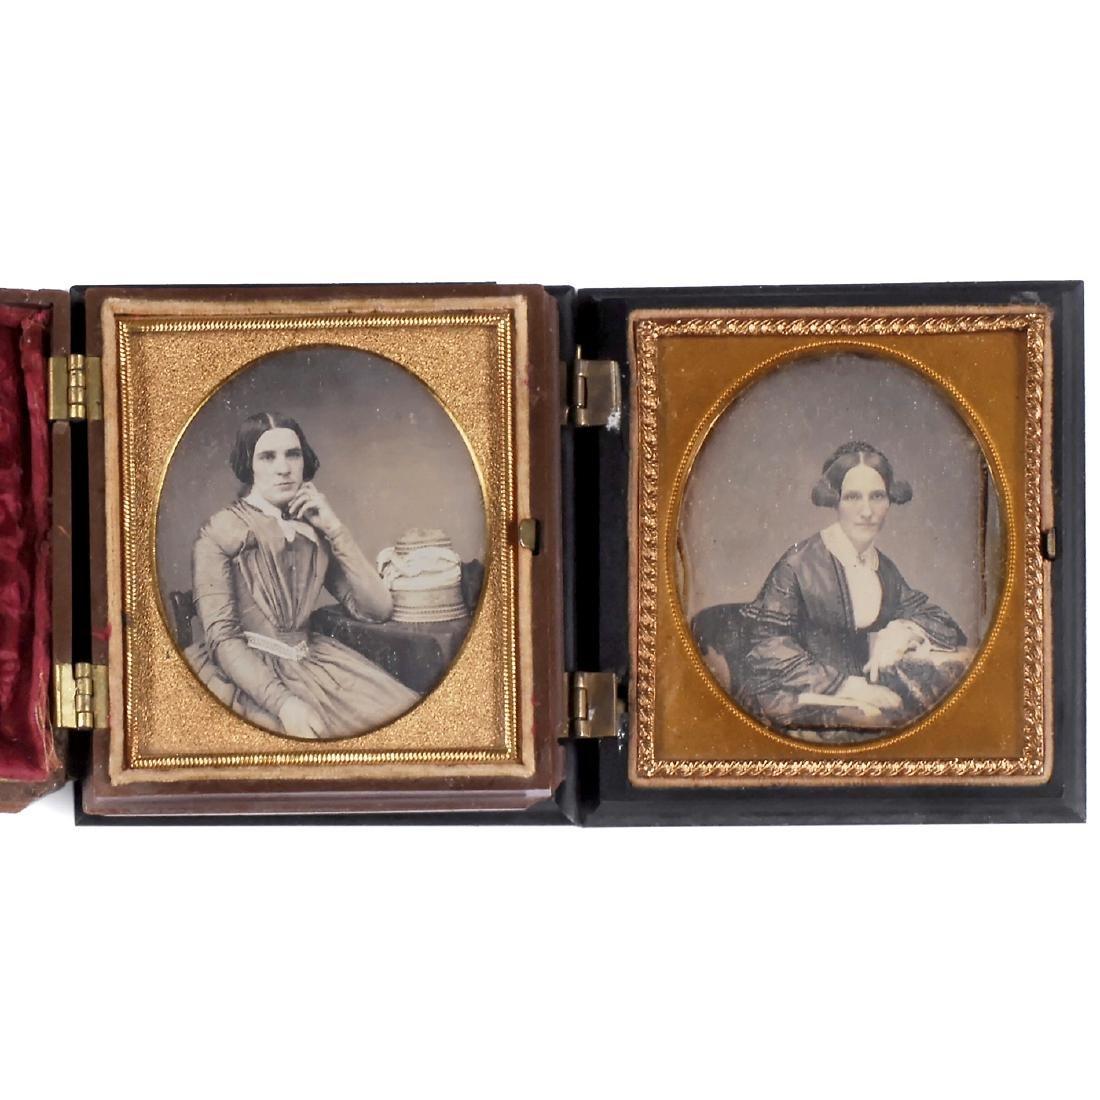 2 Daguerreotypes from America, c. 1851